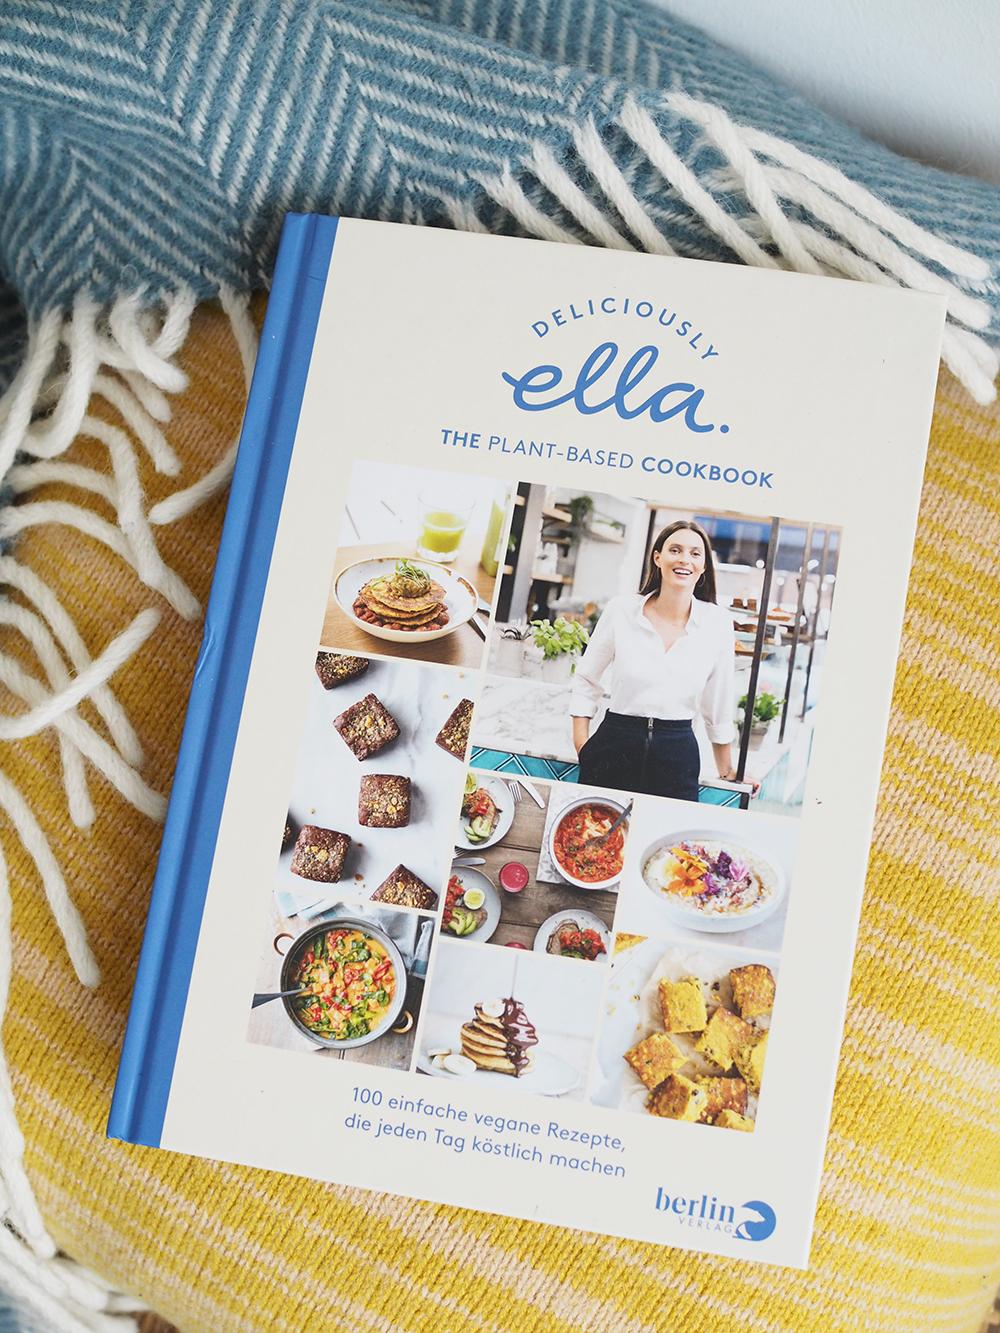 ella woodward deliciously ella the plant-based cookbook